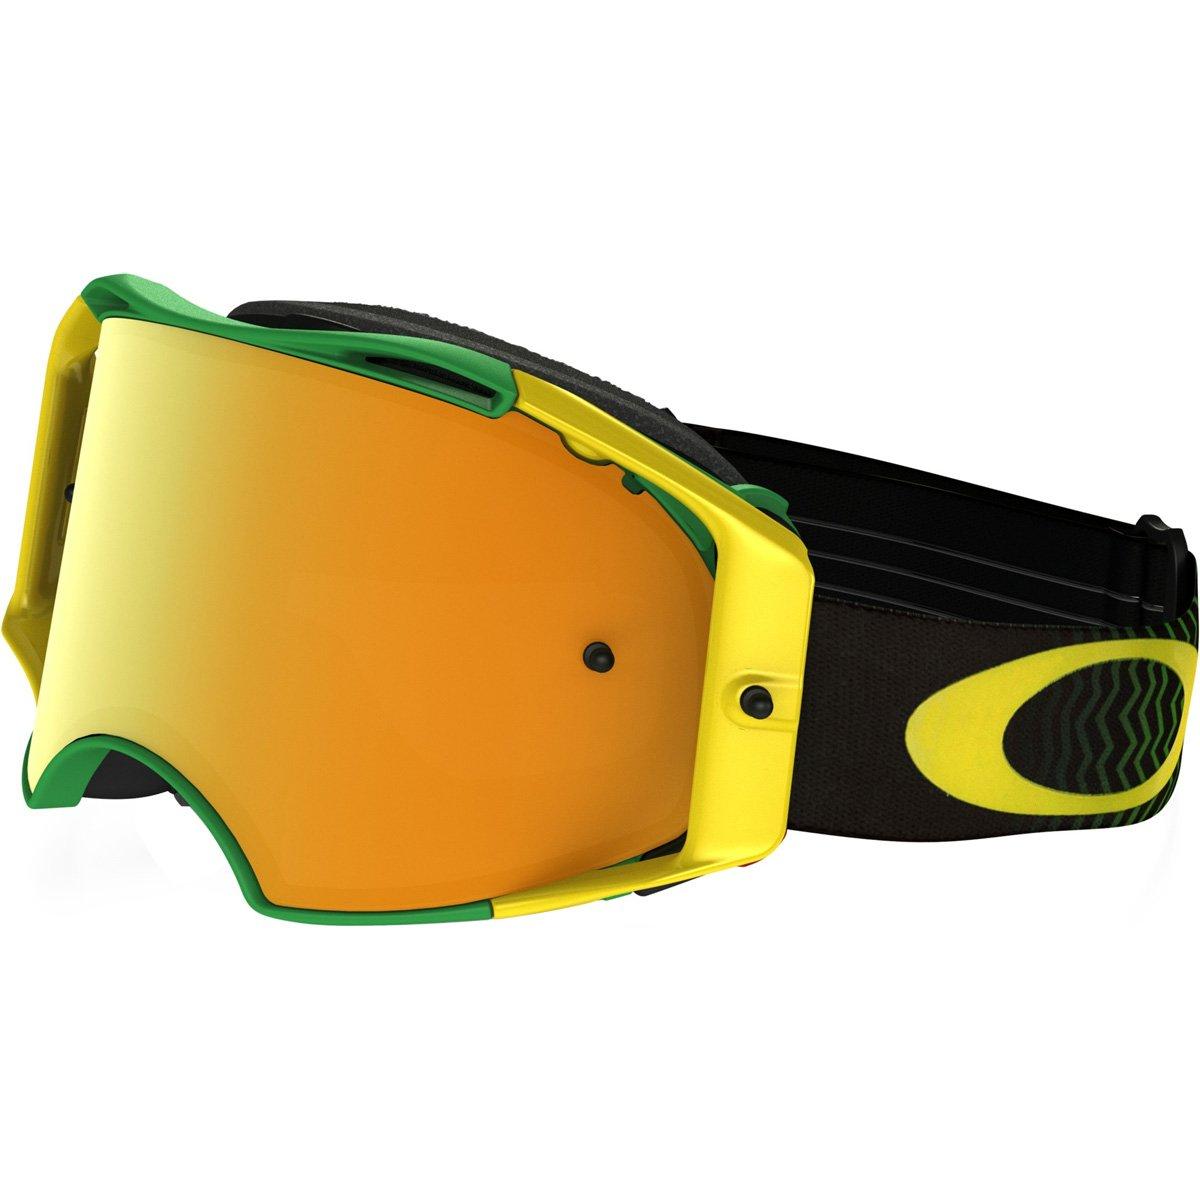 Oakley Airbrake MX Shockwave Men's Dirt Motocross Motorcycle Goggles Eyewear - Green Yellow/24K Iridium/One Size Fits All